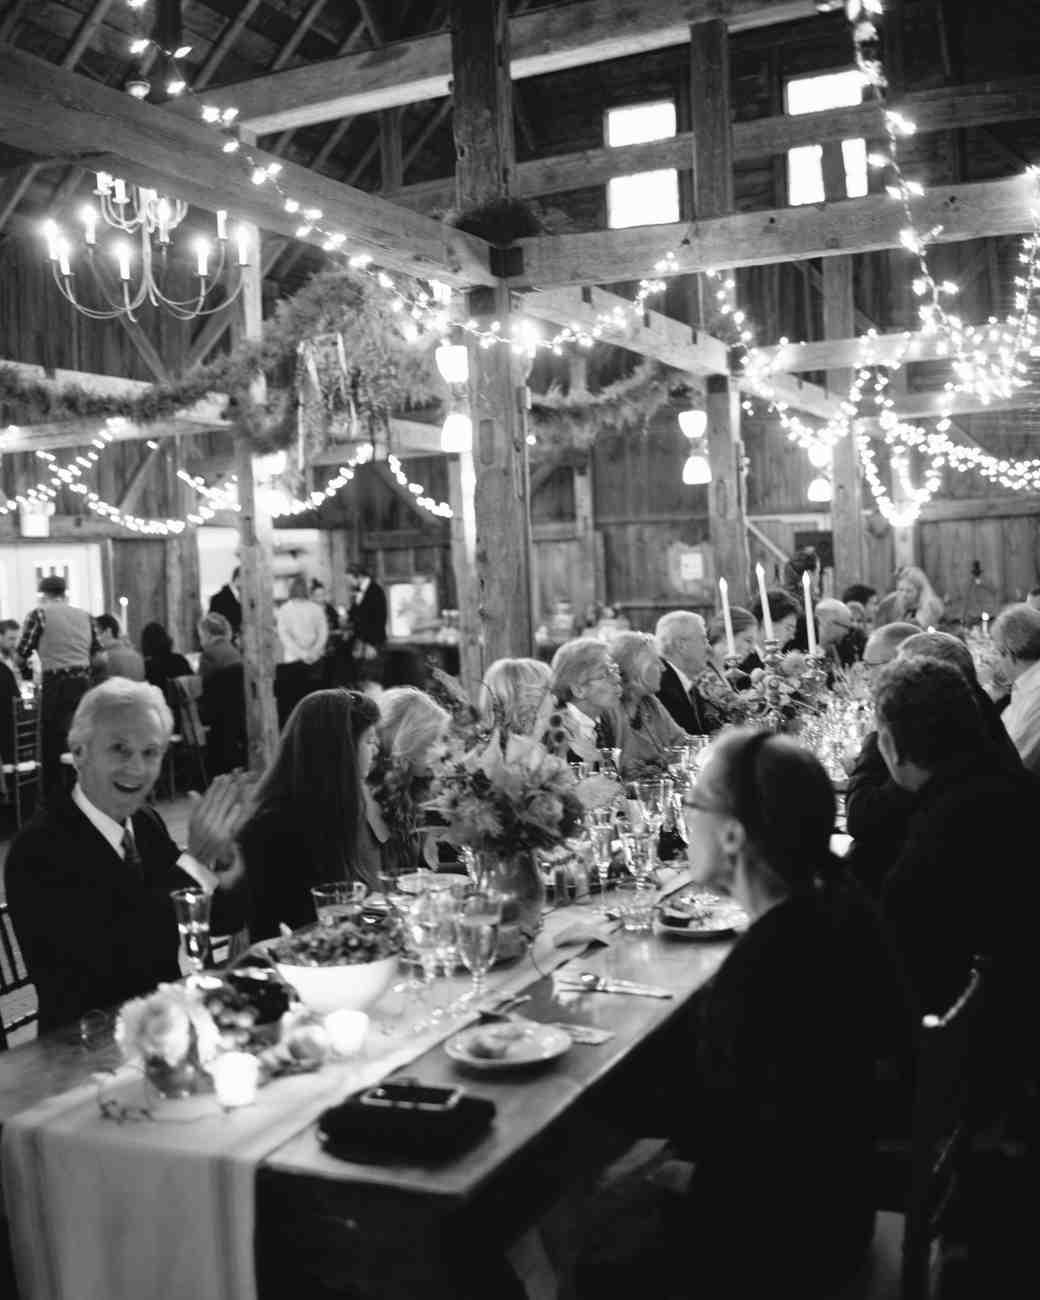 Fall Rustic Barn Weddings